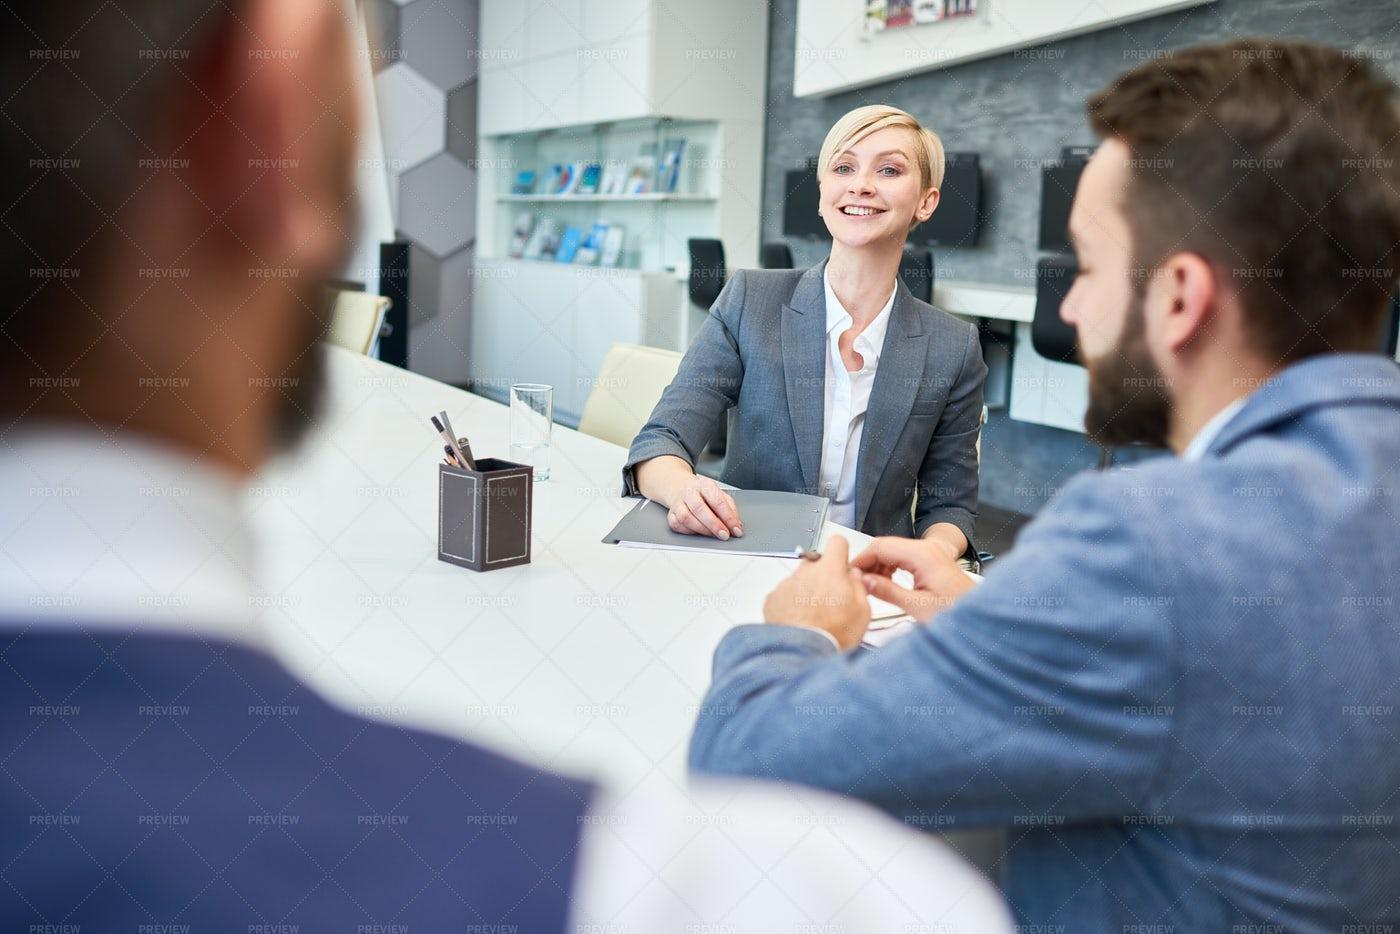 Smiling Business Woman Meeting ...: Stock Photos